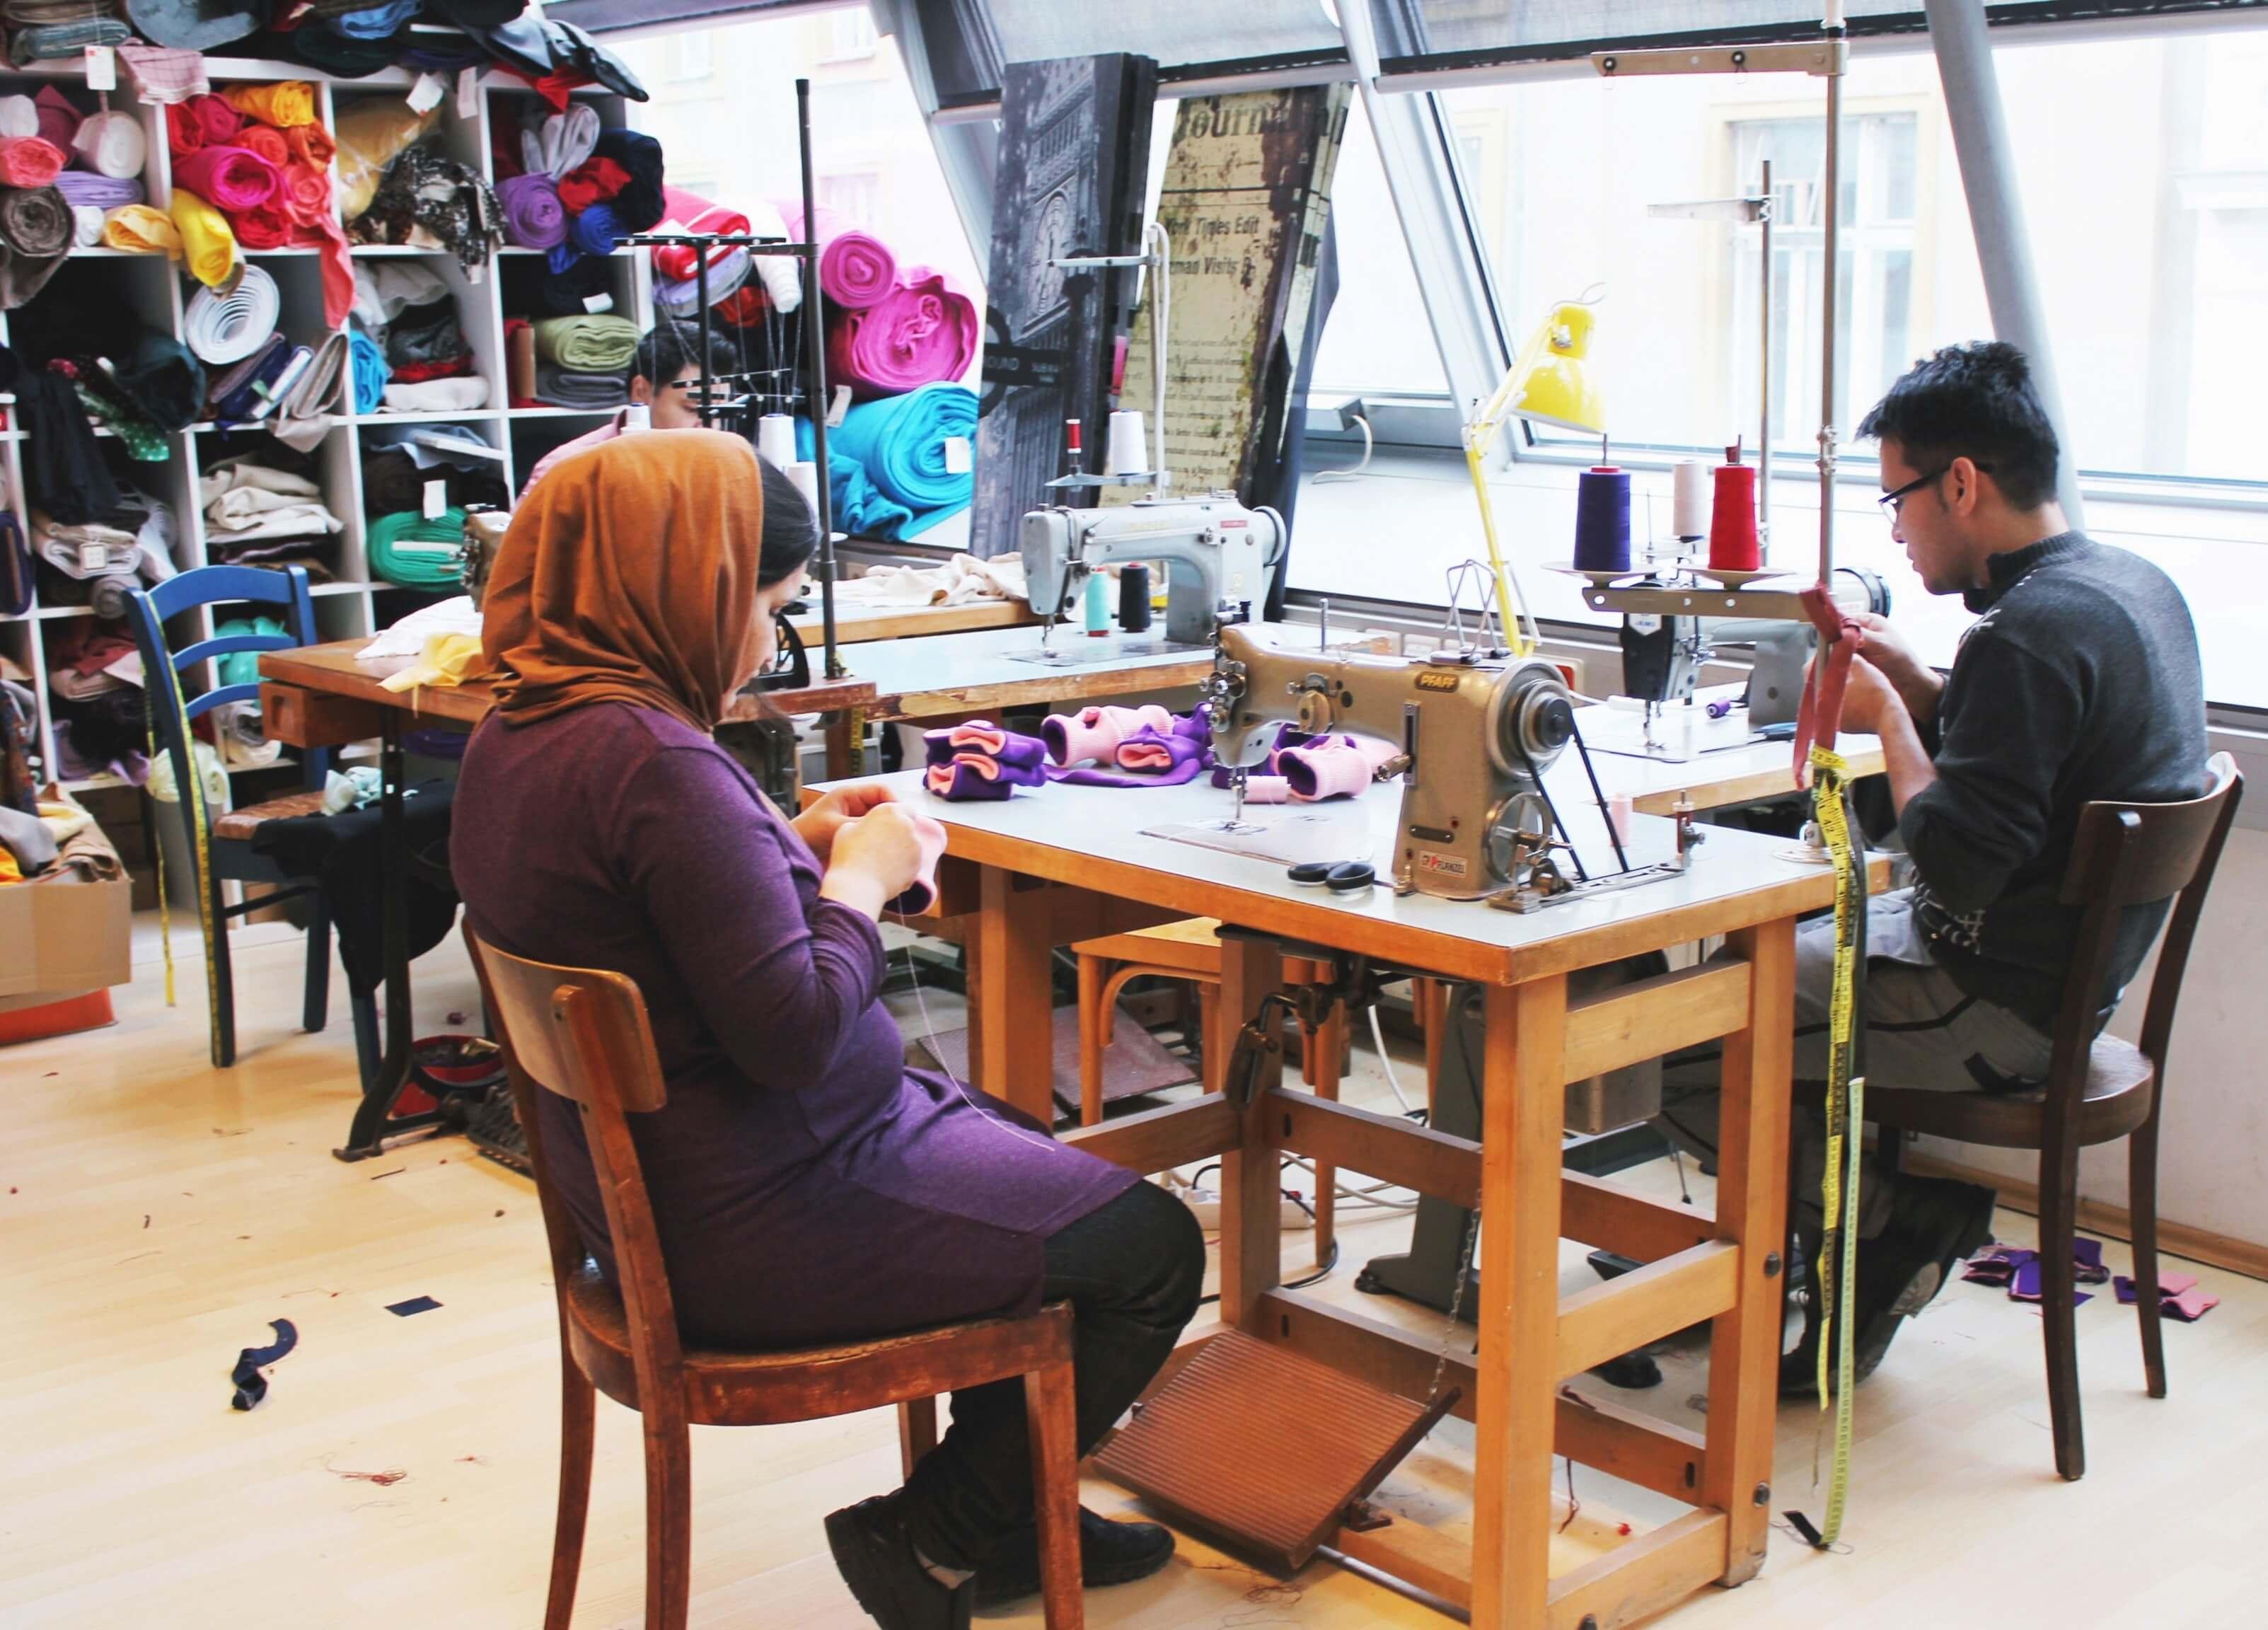 Kattunfabrik – Das Cuture Lab. Reparieren statt wegwerfen.